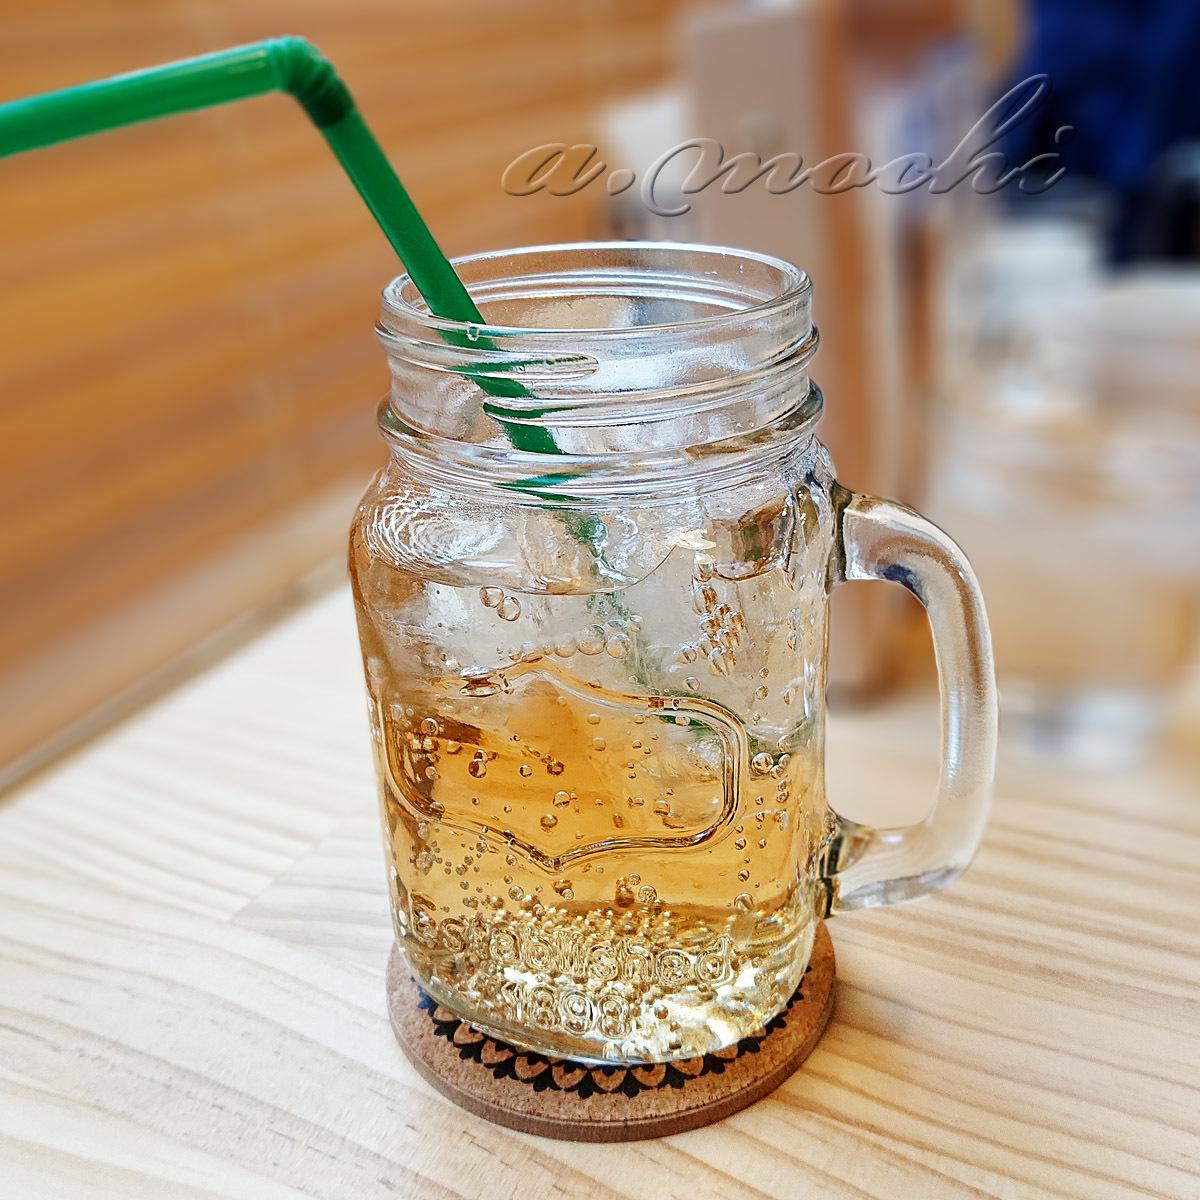 lifelong_drink.jpg